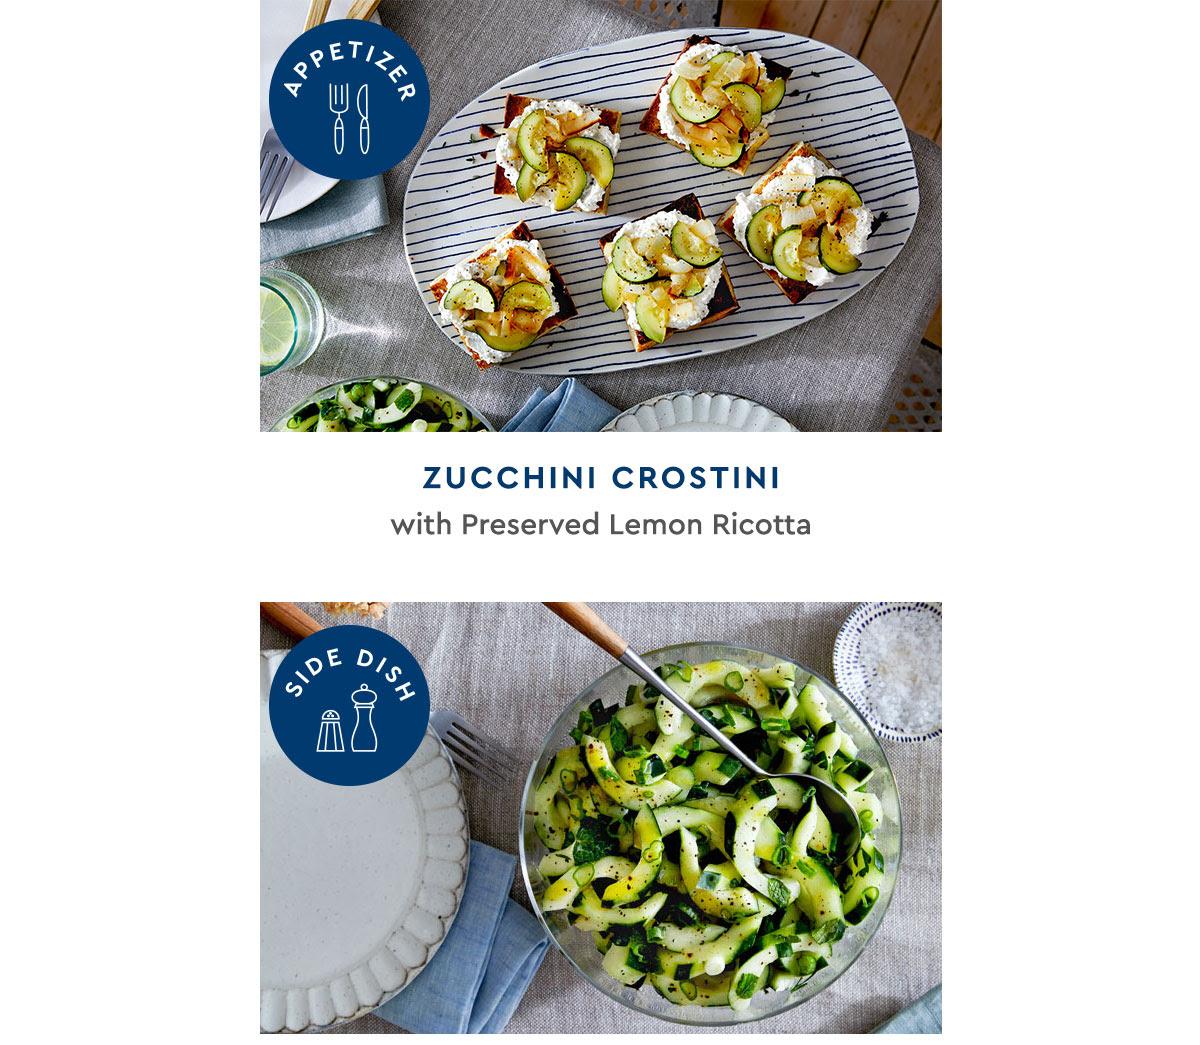 Zucchini crostini and cucumber salad